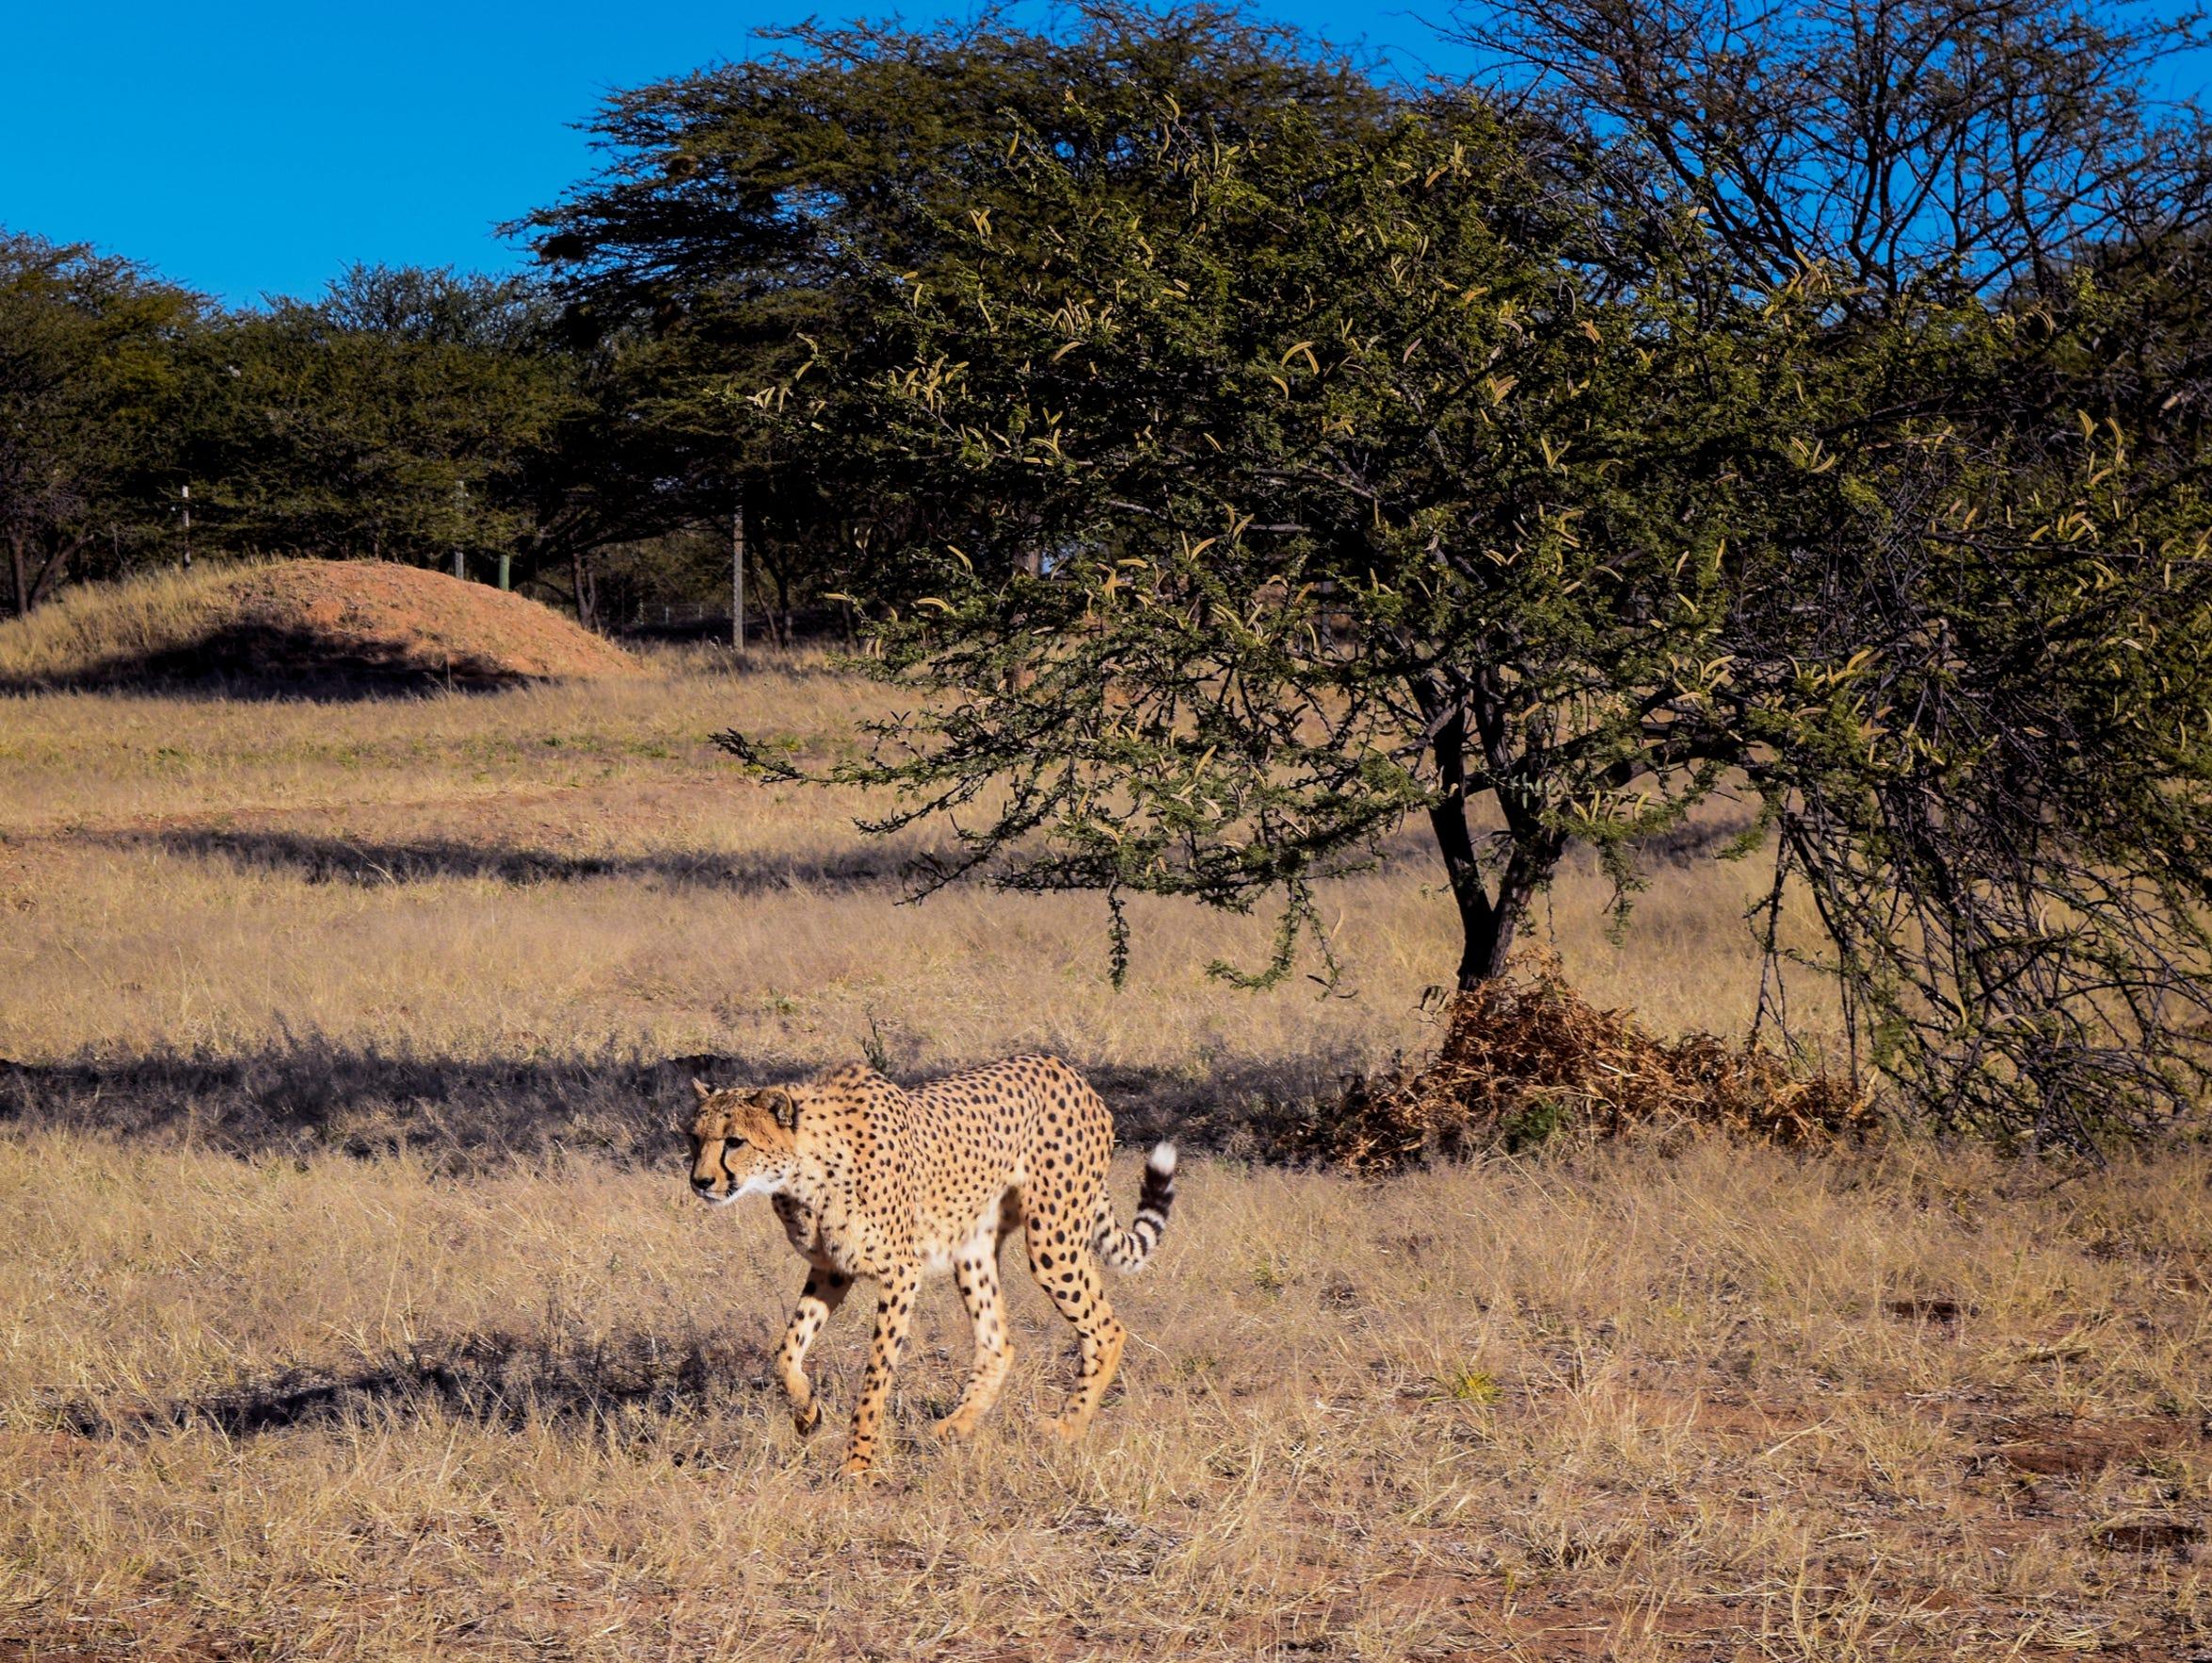 A cheetah takes part in a run at the Cheetah Conservation